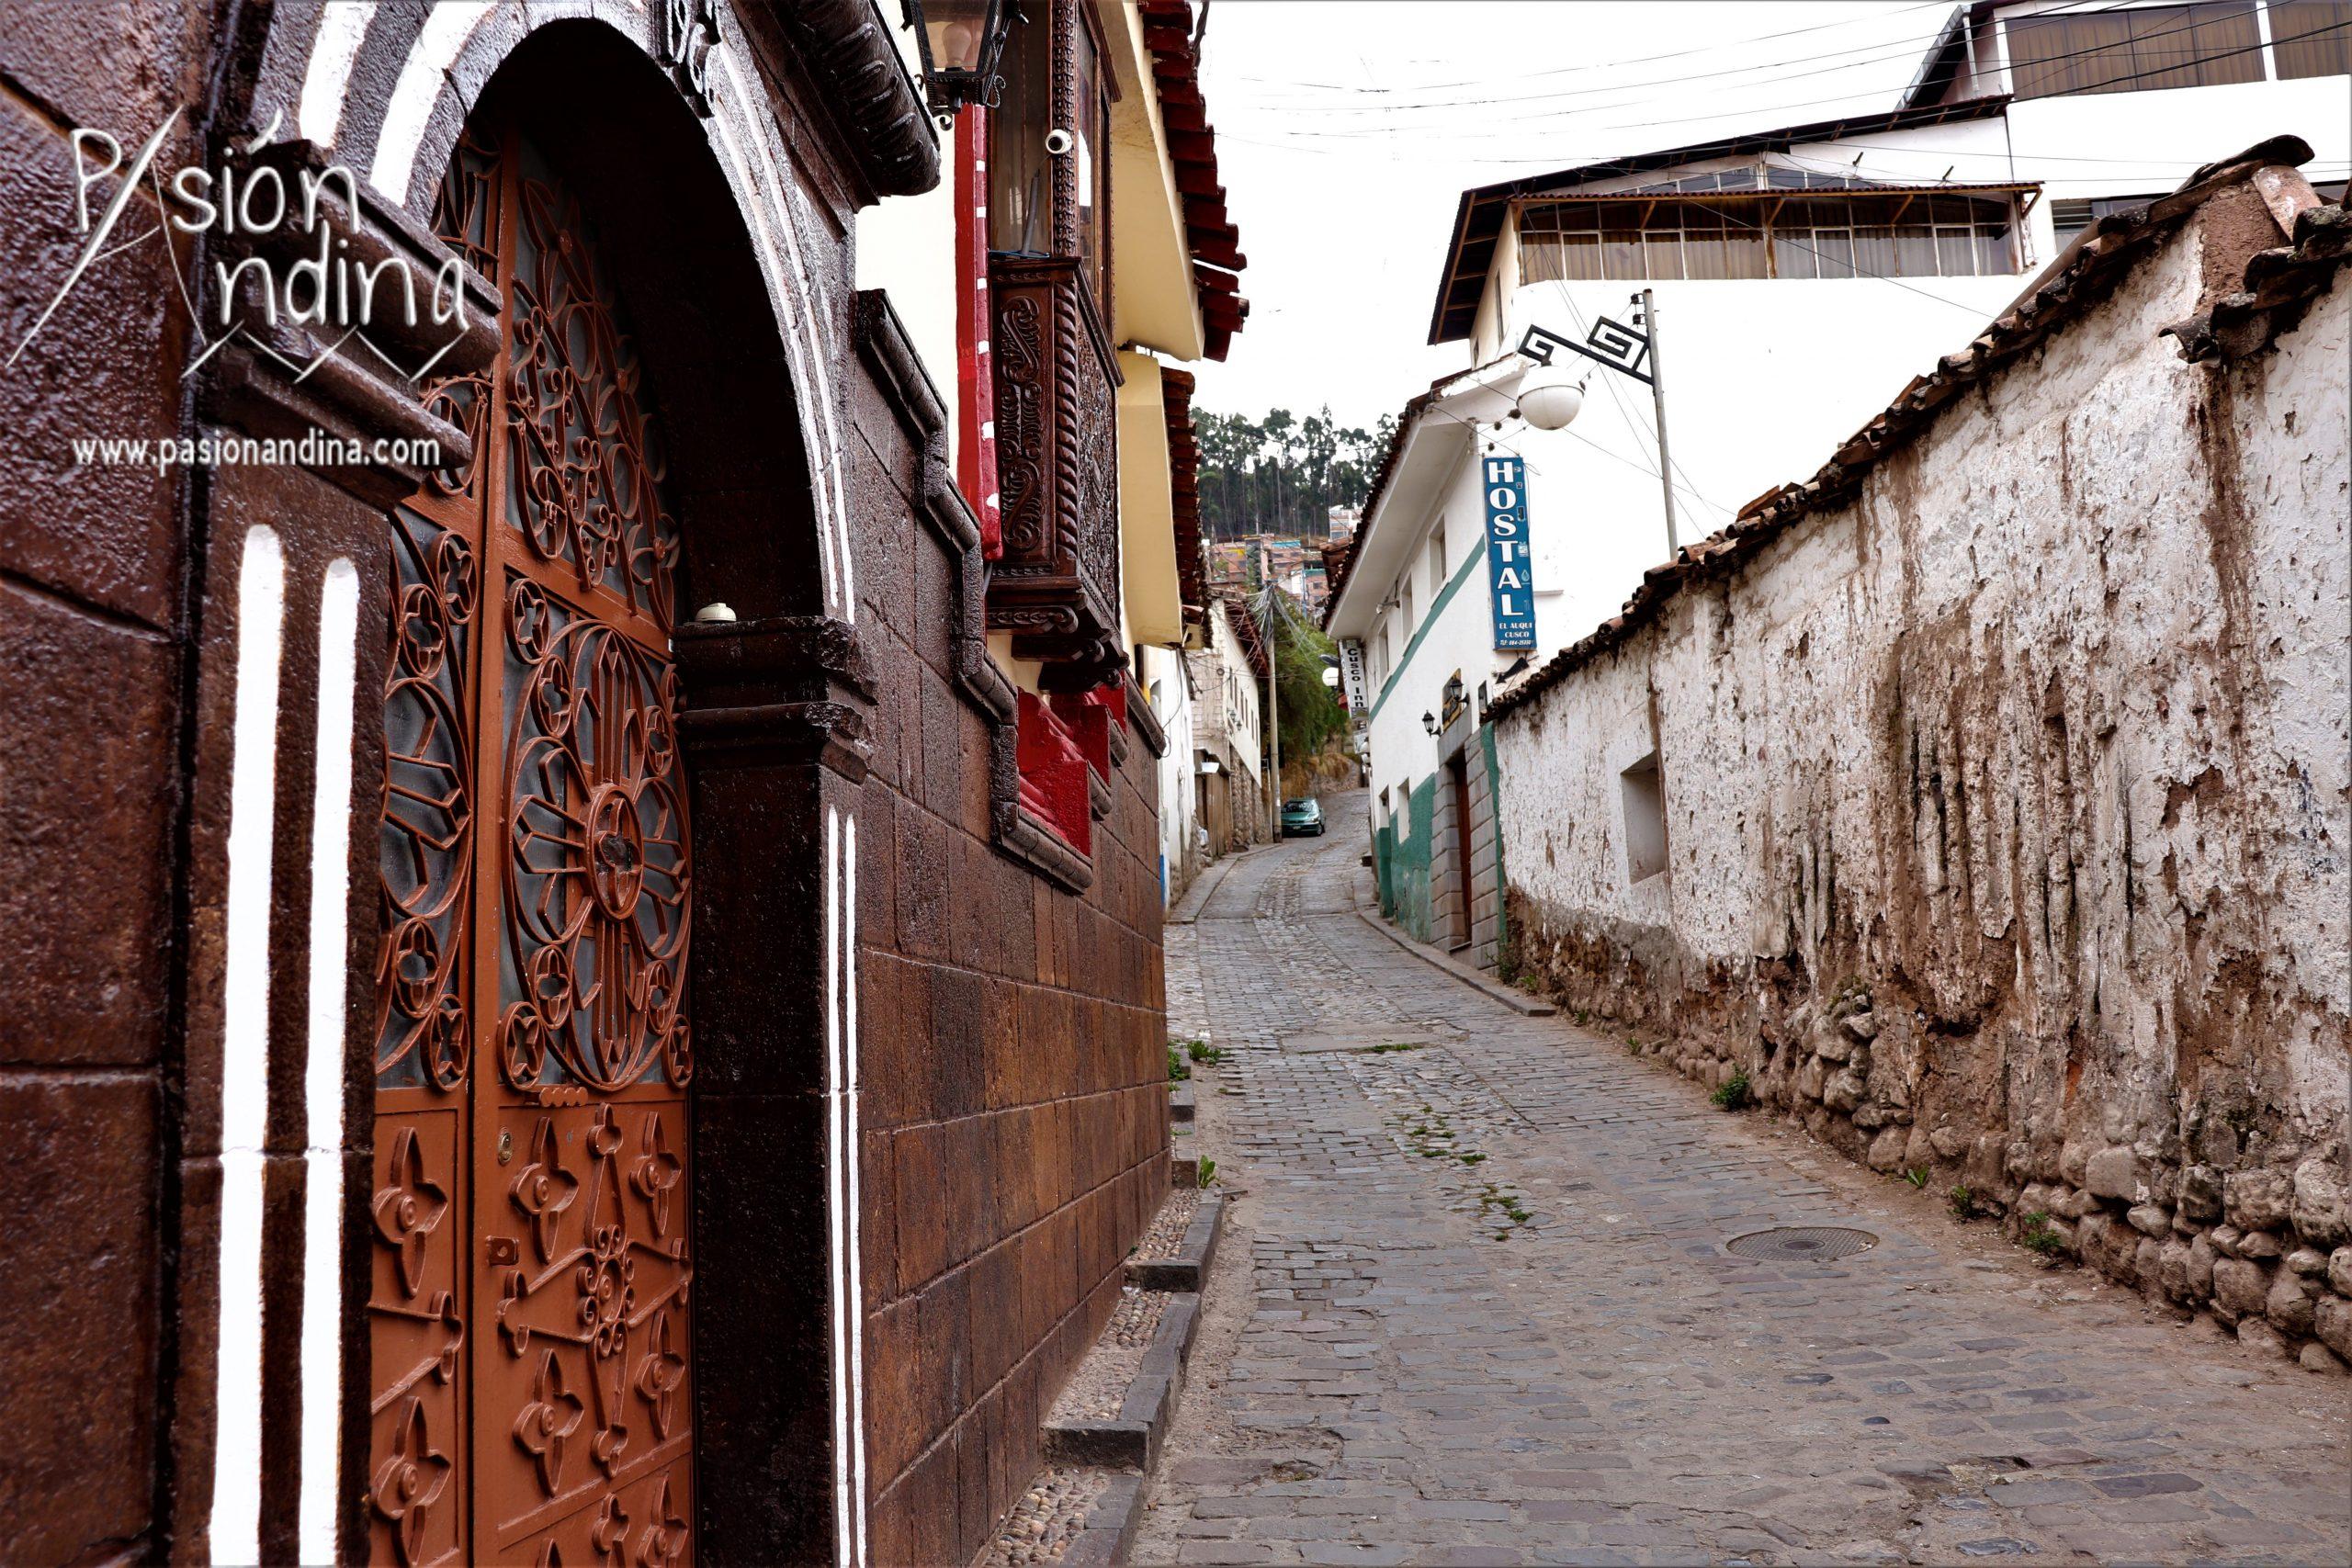 Calle Pumapaqcha - Pasion Andina - Cusco